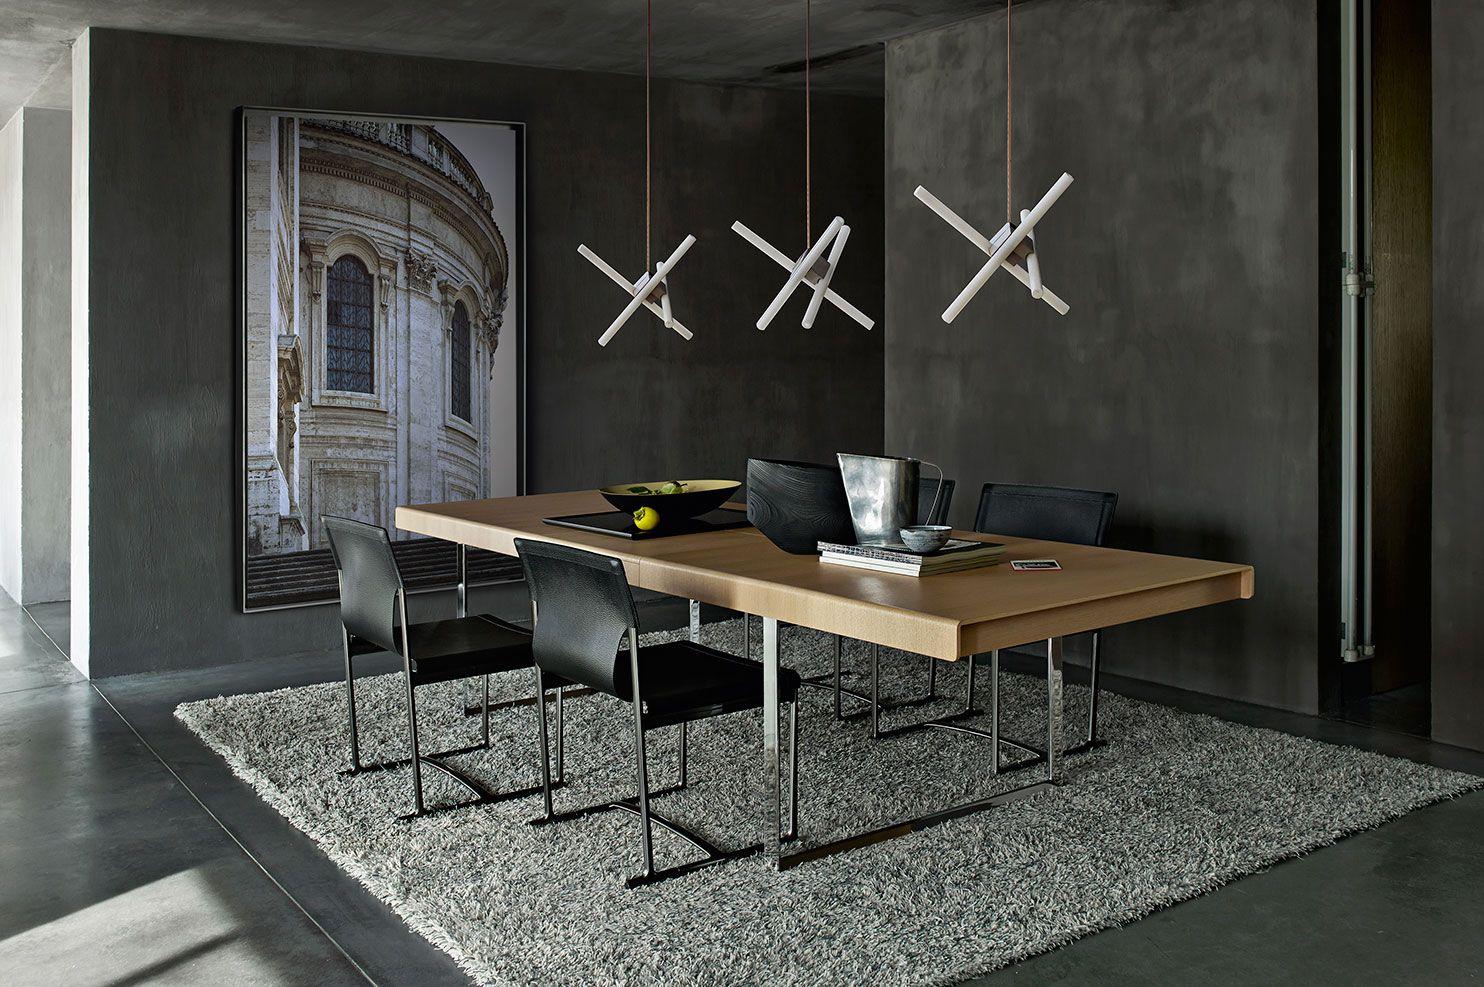 Design Paolo Piva.Table Athos 2012 Collection B B Italia Design Paolo